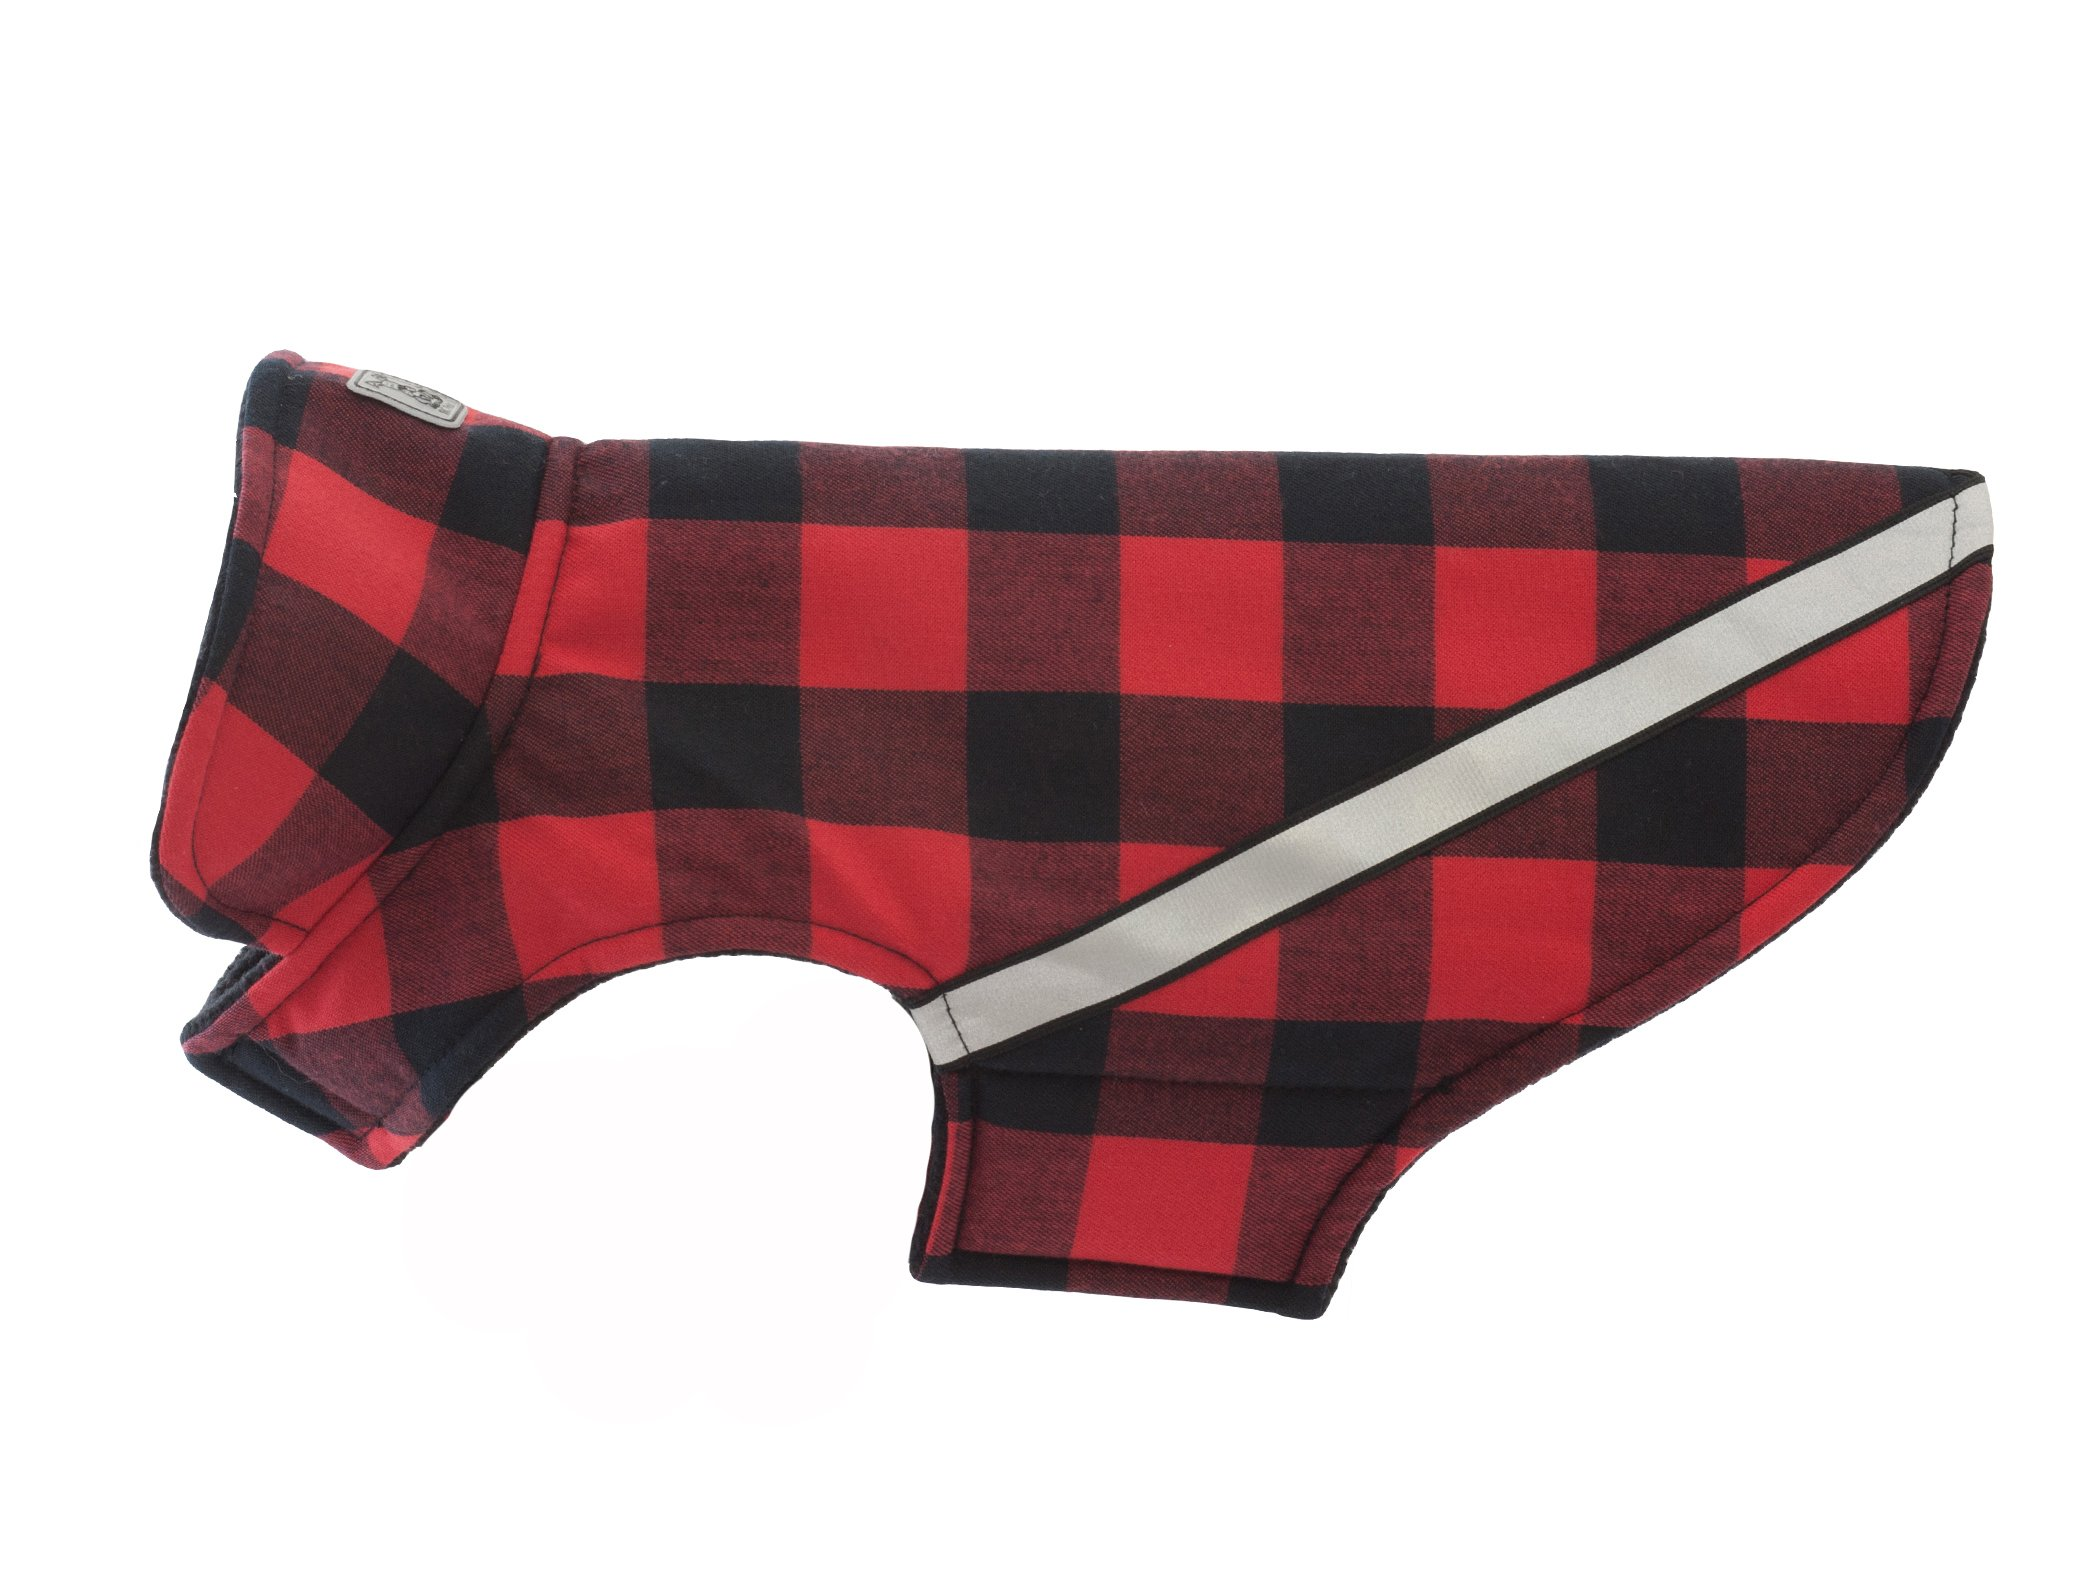 RC Pet Products West Coast Rainwear Raincoat, Fleece Lined, Water-Resistant, Reflective Dog Coat, Size 22, Red Buffalo Plaid